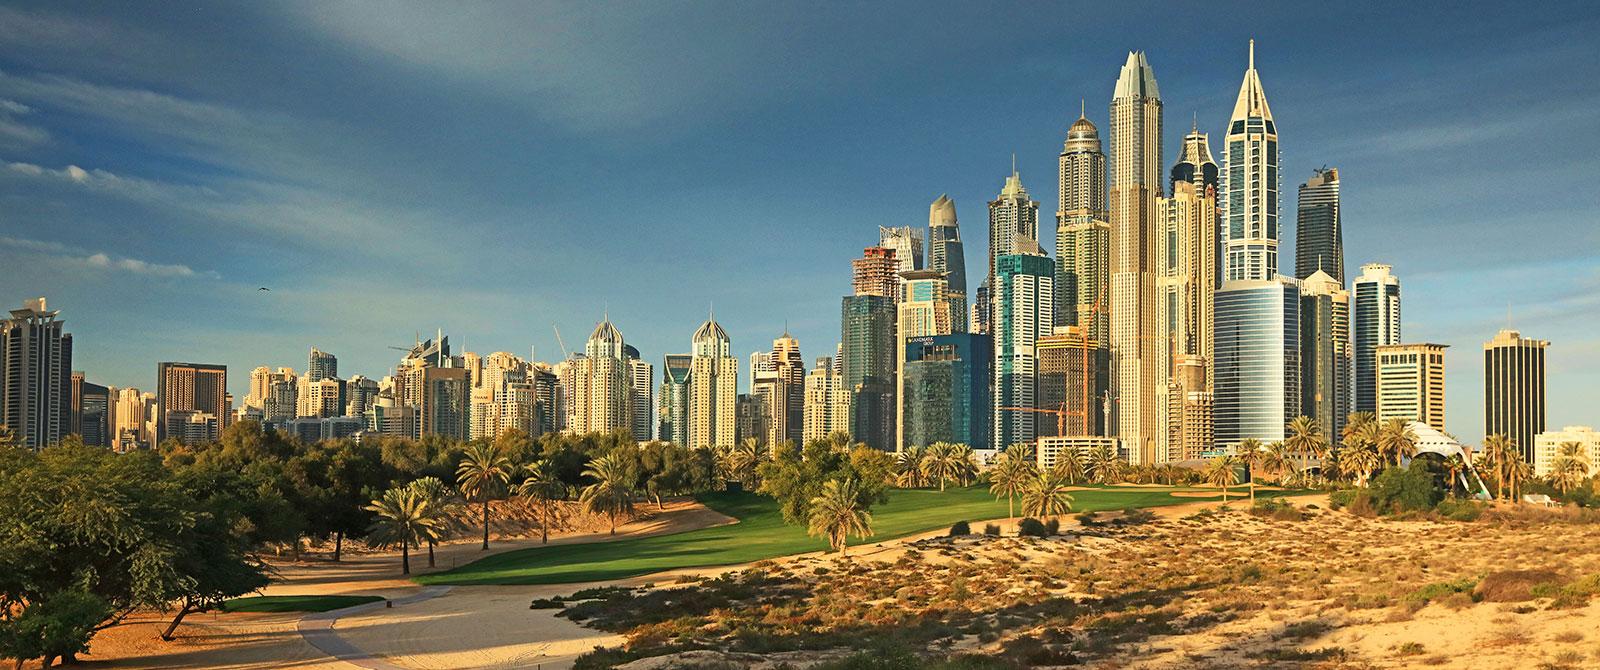 Emirates Golf Club - The Majlis course with Dubai skyline